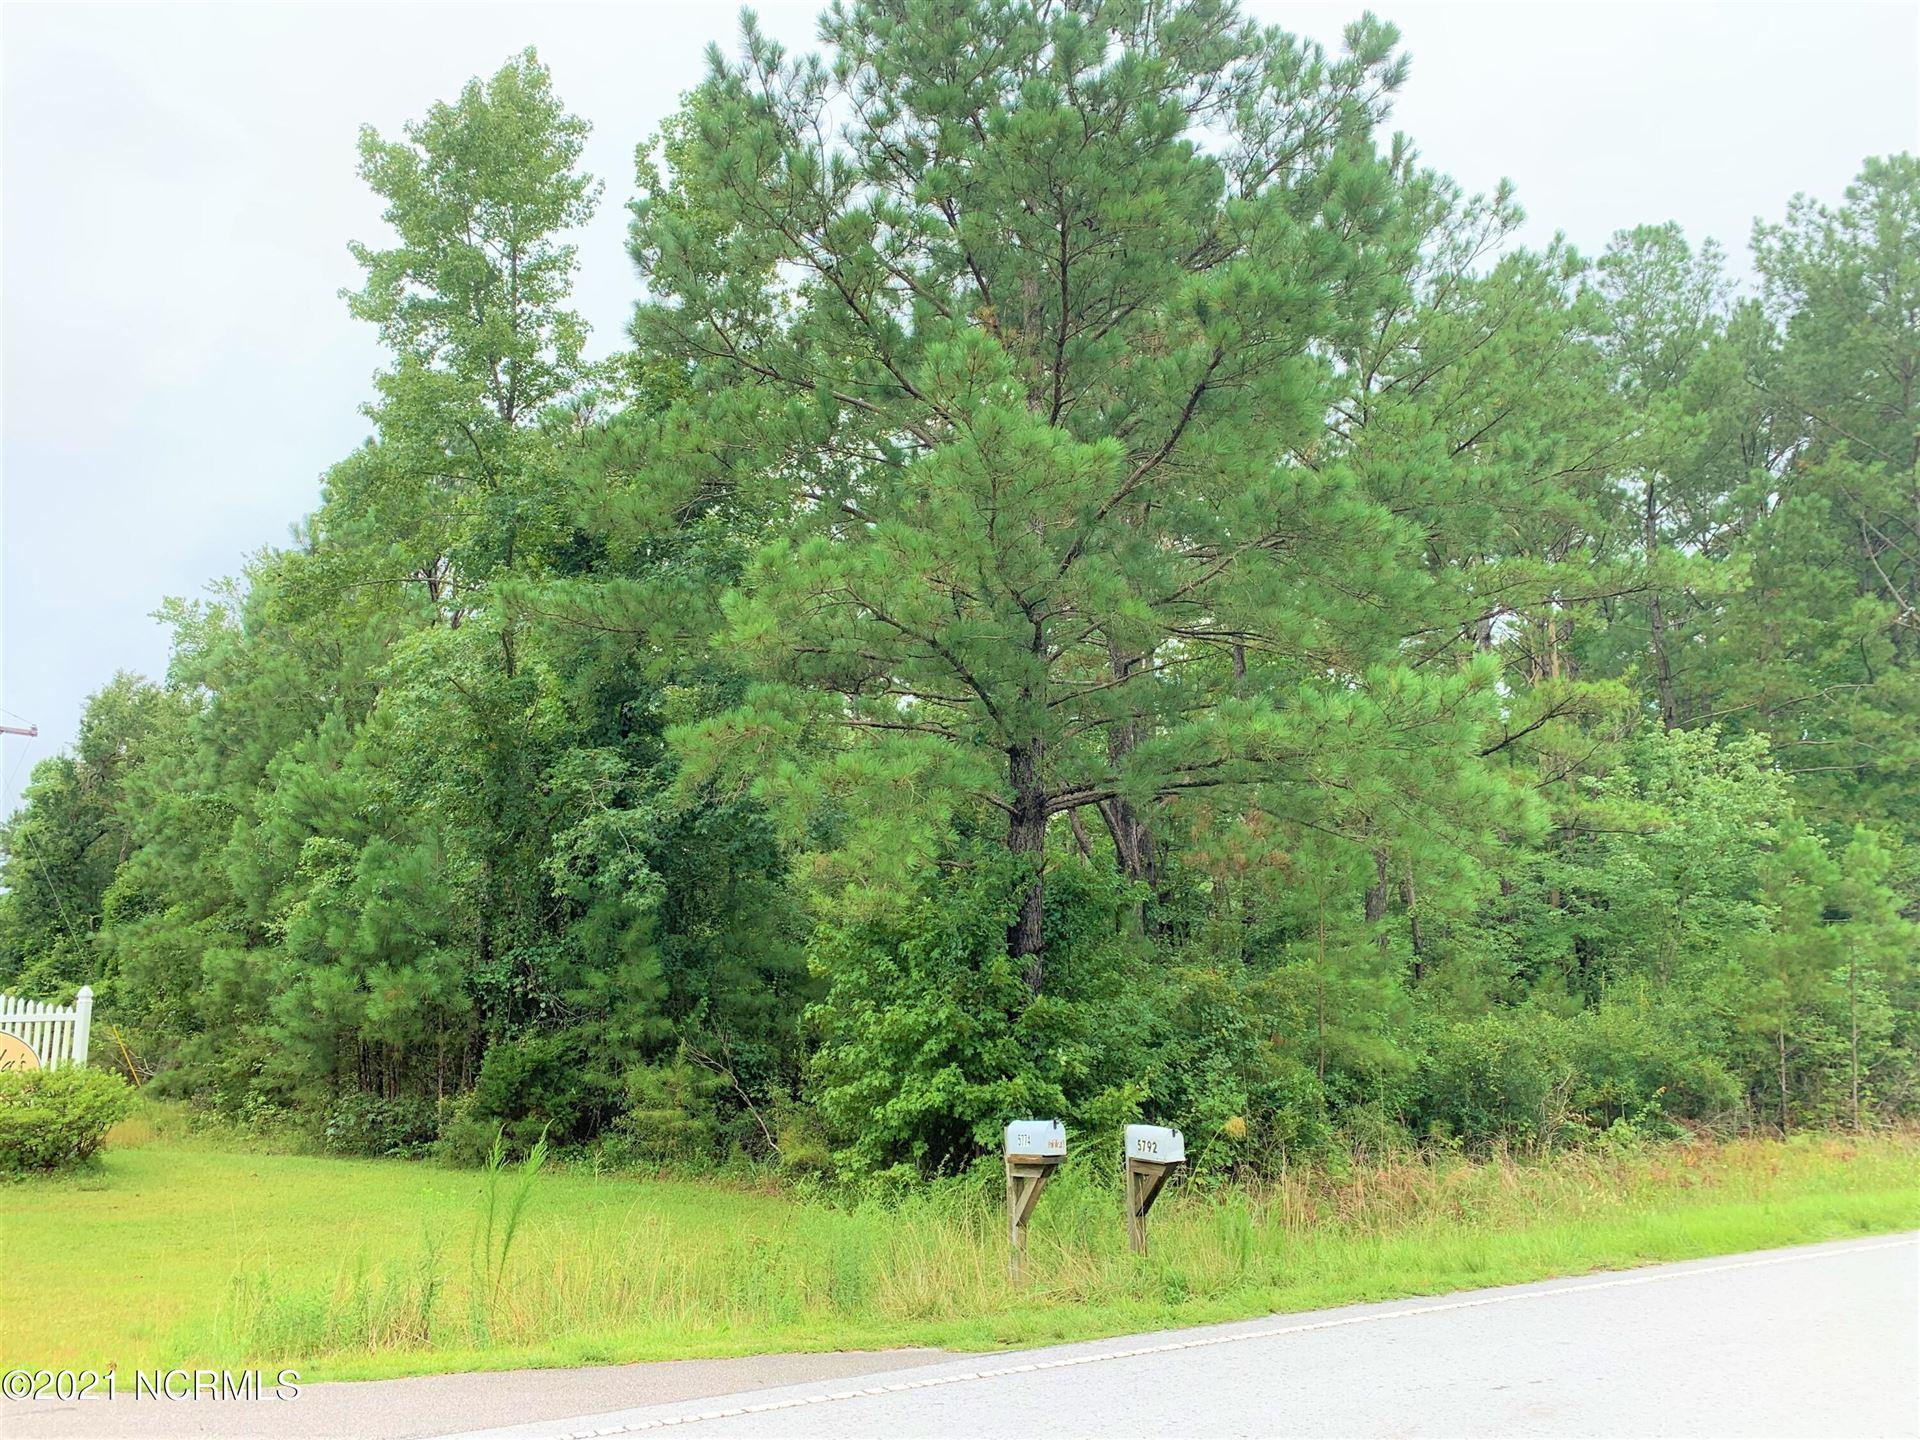 Photo of Tbd Lot 3 Burgaw Highway, Maple Hill, NC 28454 (MLS # 100285591)